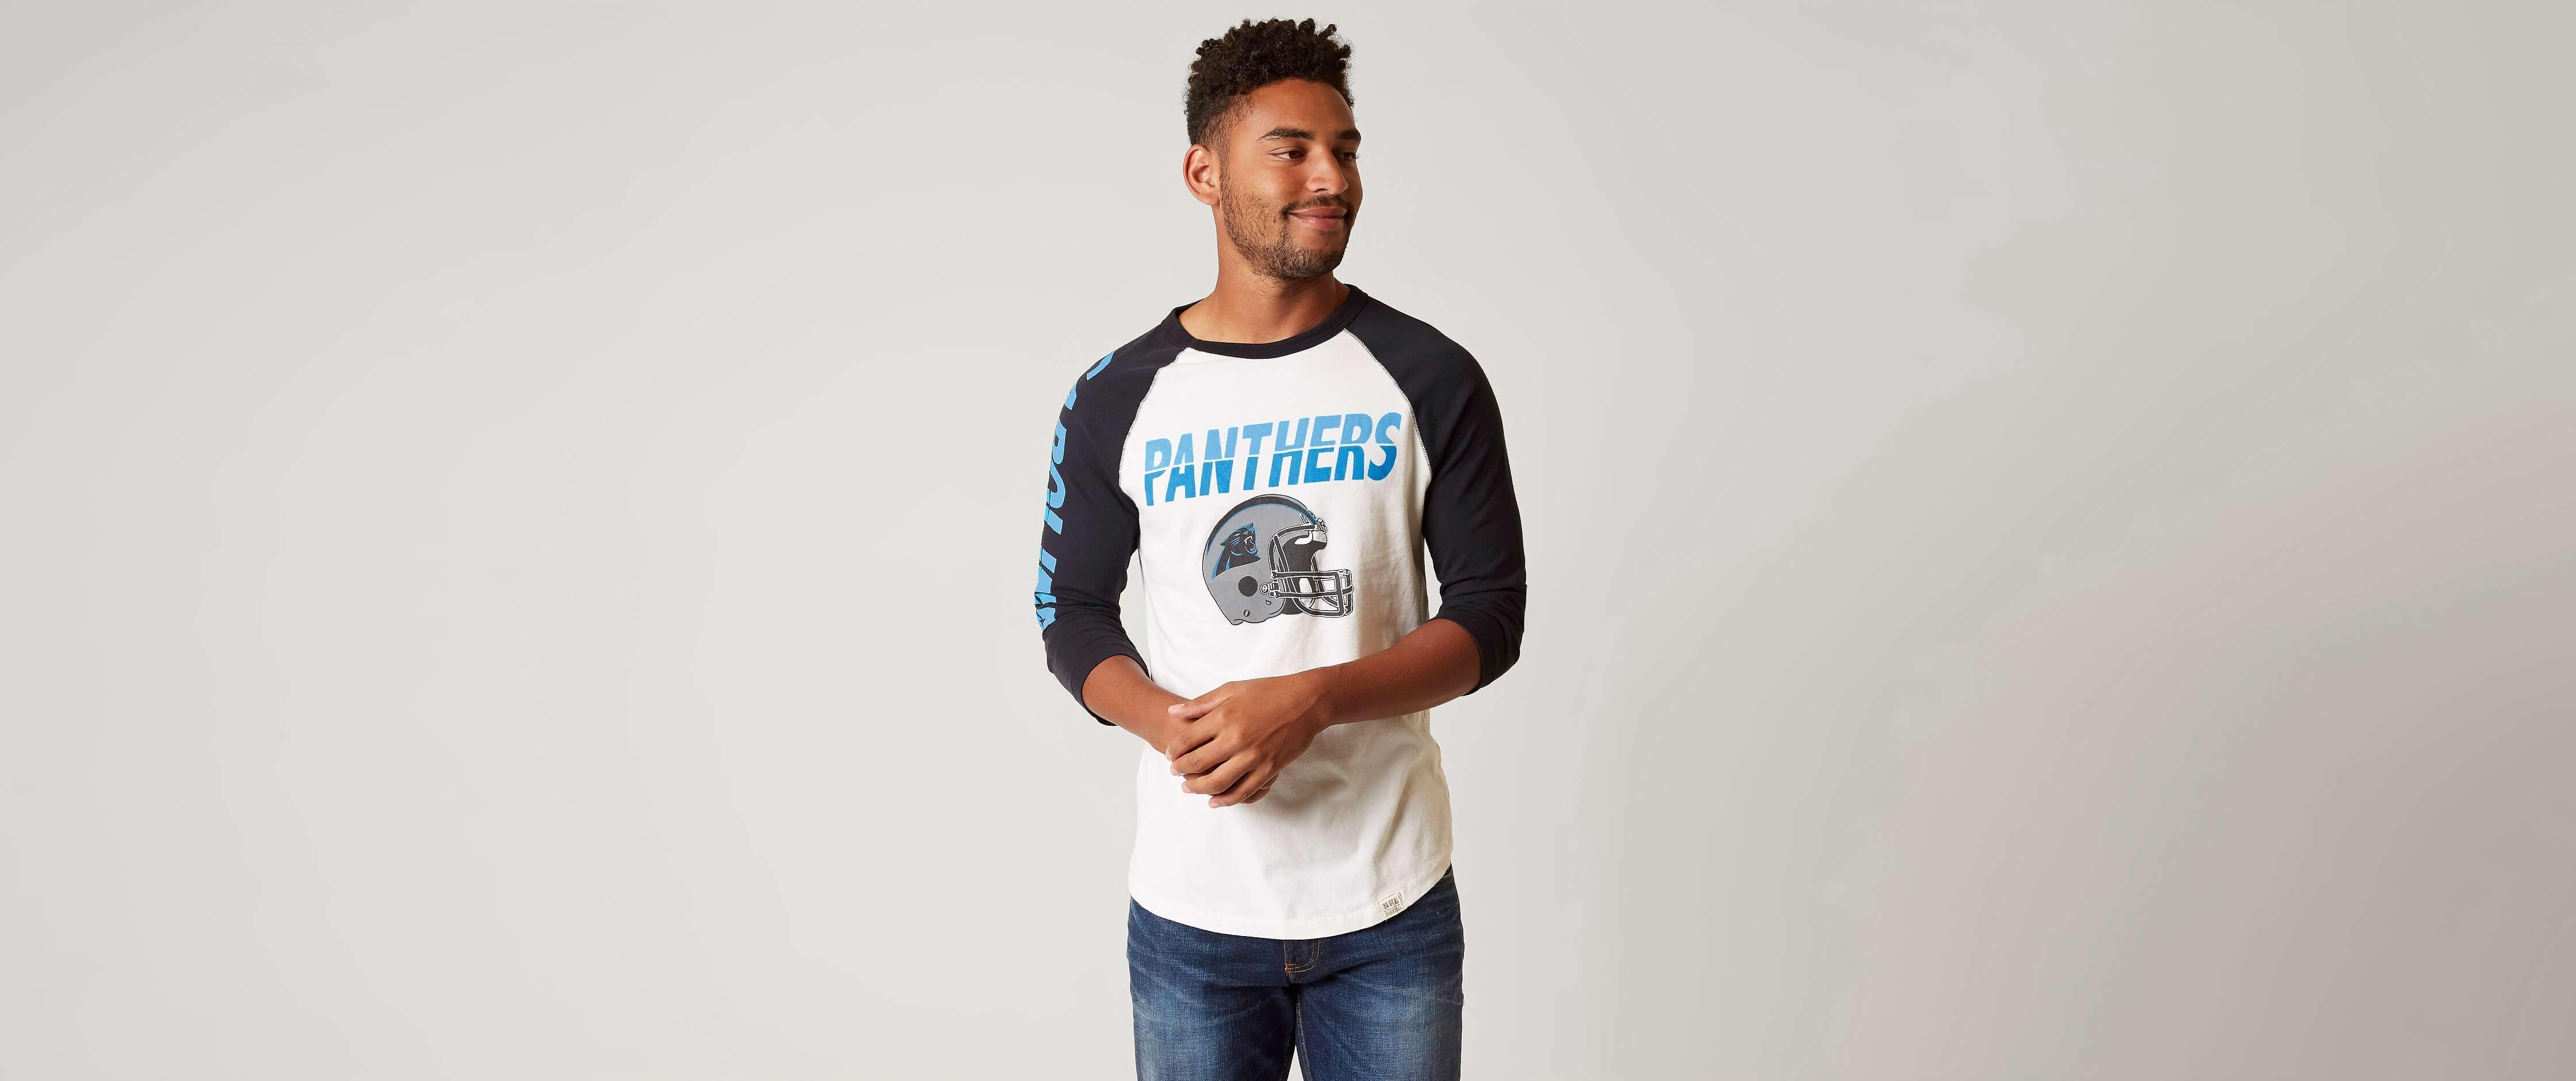 Hot Junk Food Carolina Panthers T-Shirt free shipping